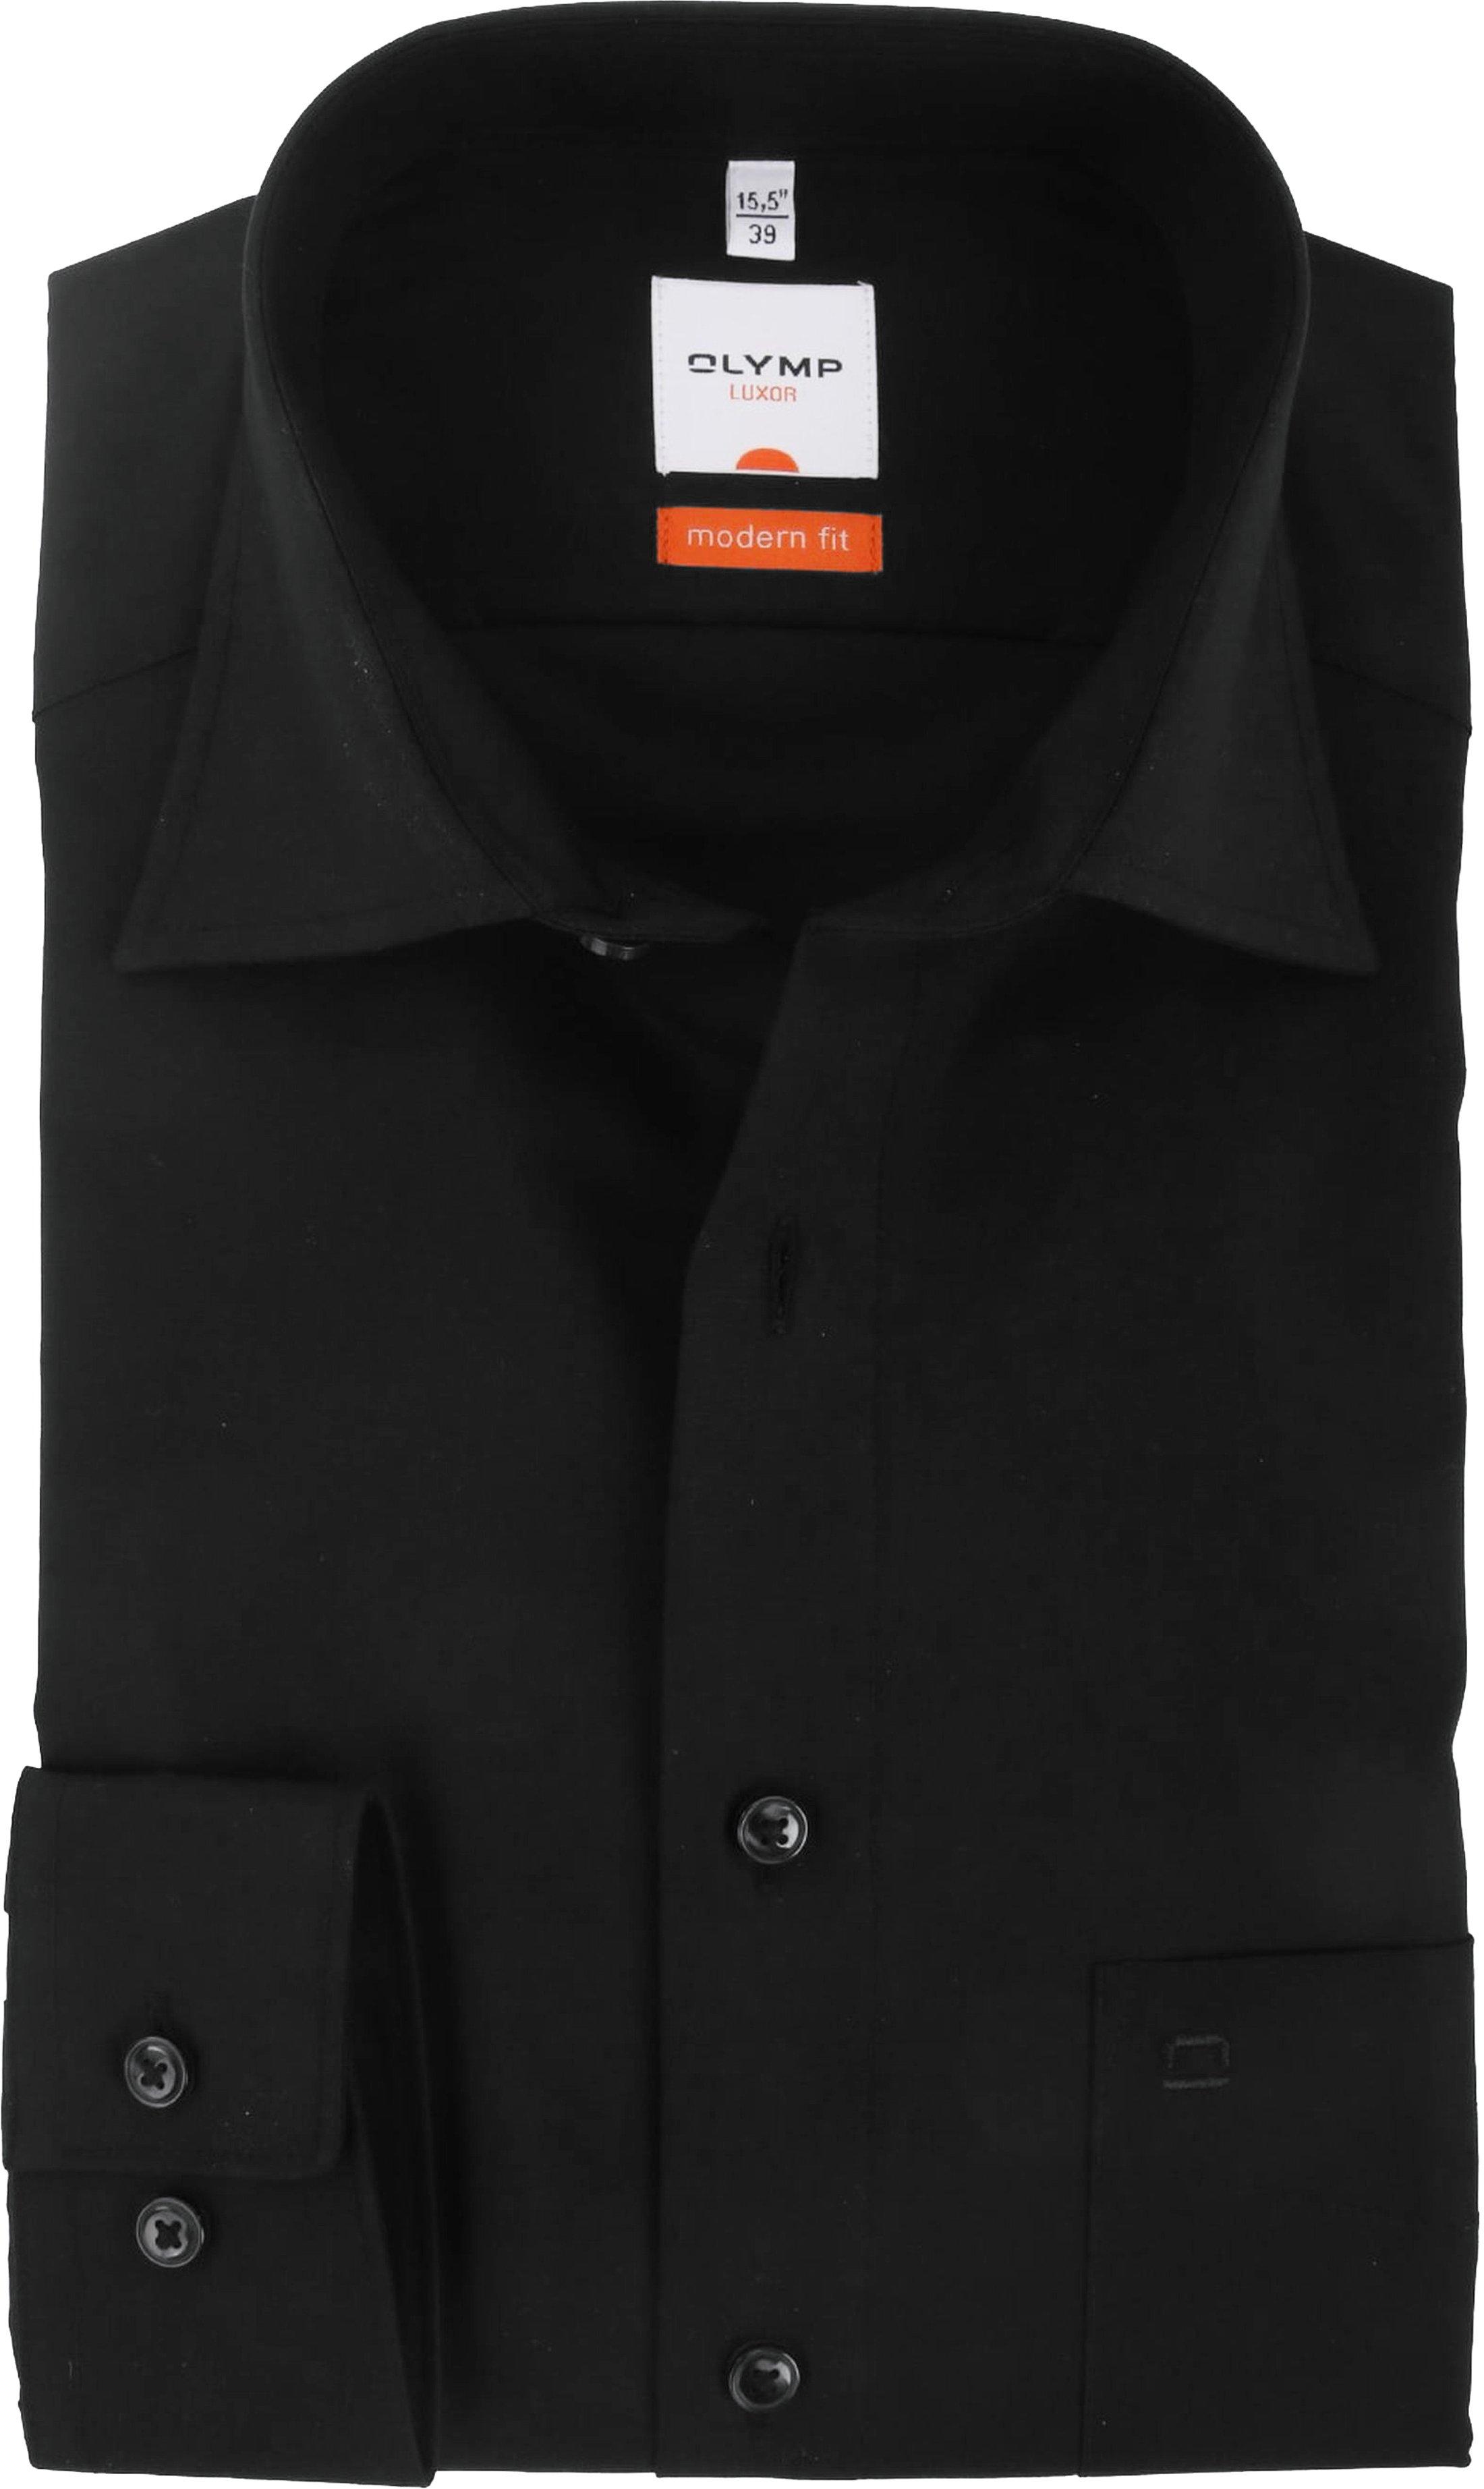 Olymp Luxor Shirt Black Modern Fit